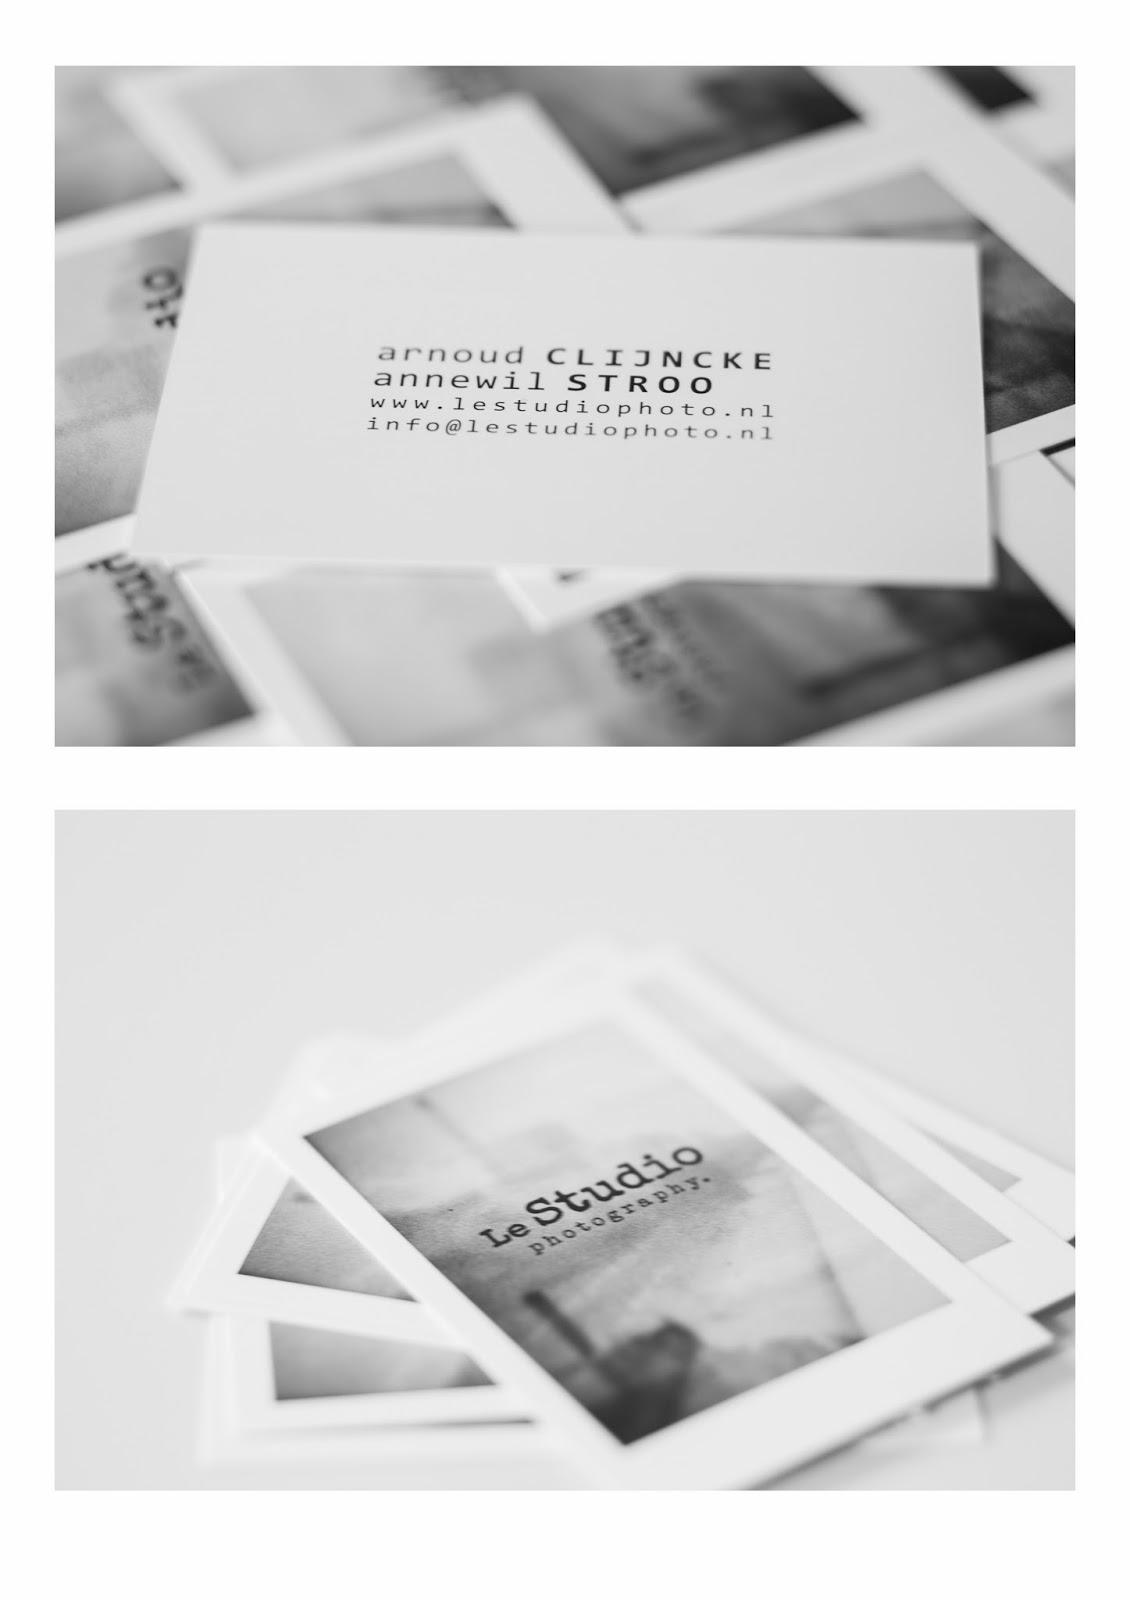 © 2014 Le Studio Photography | www.lestudiophoto.nl